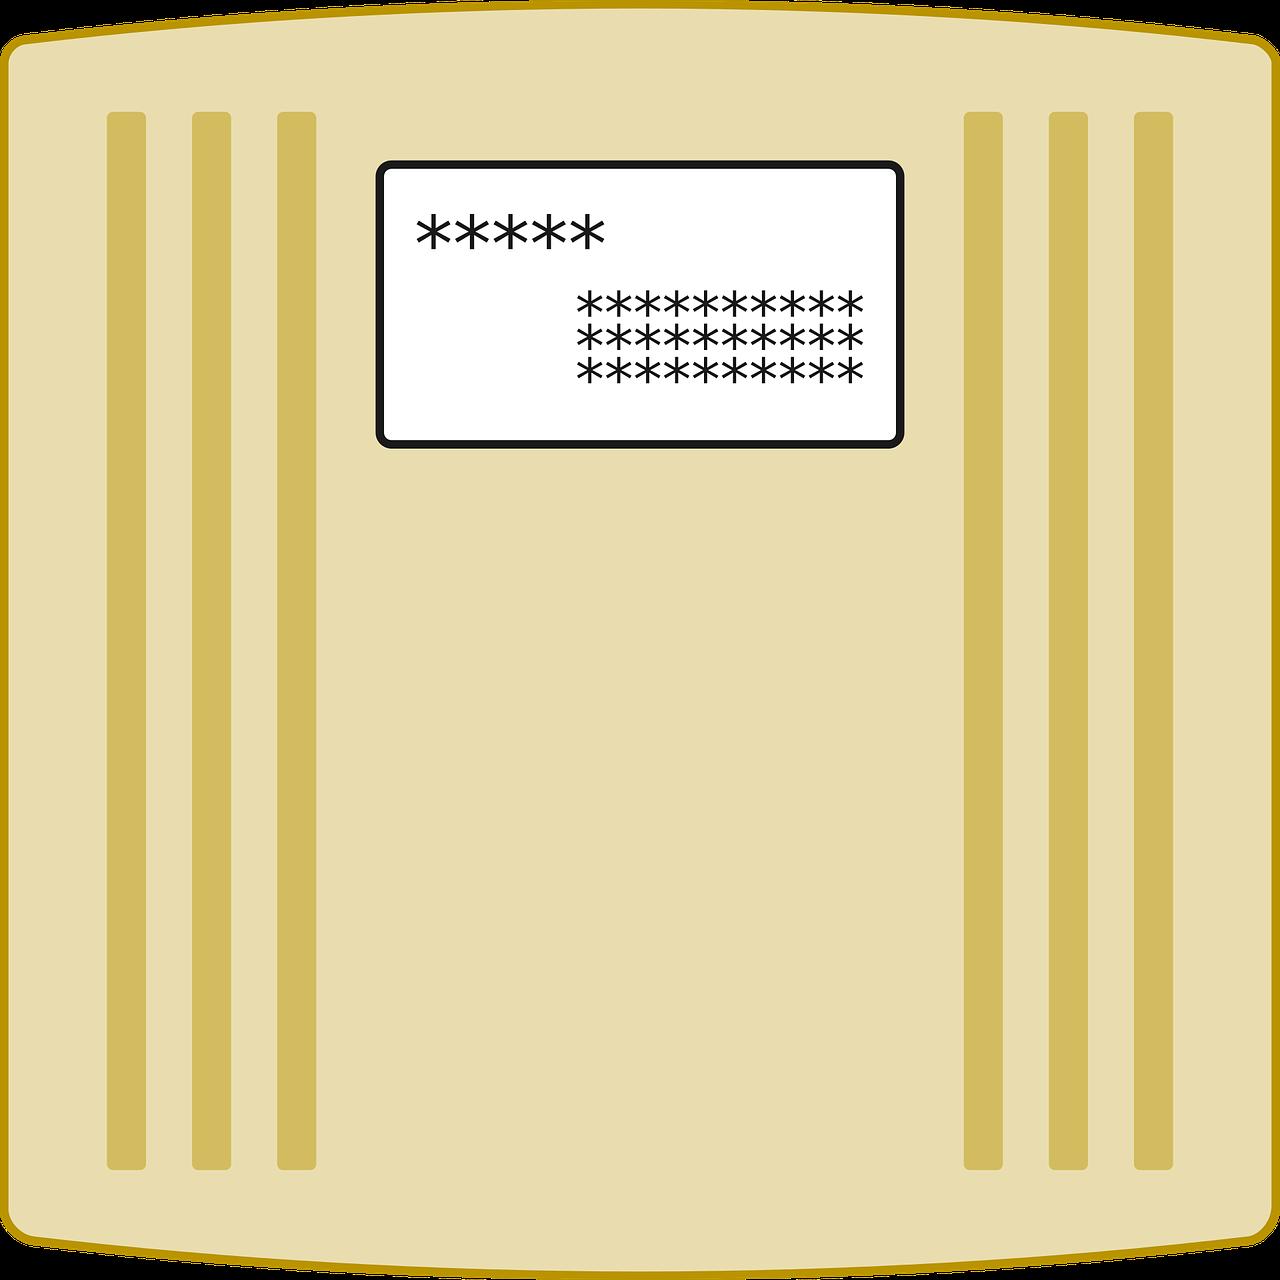 electronics-1924335_1280